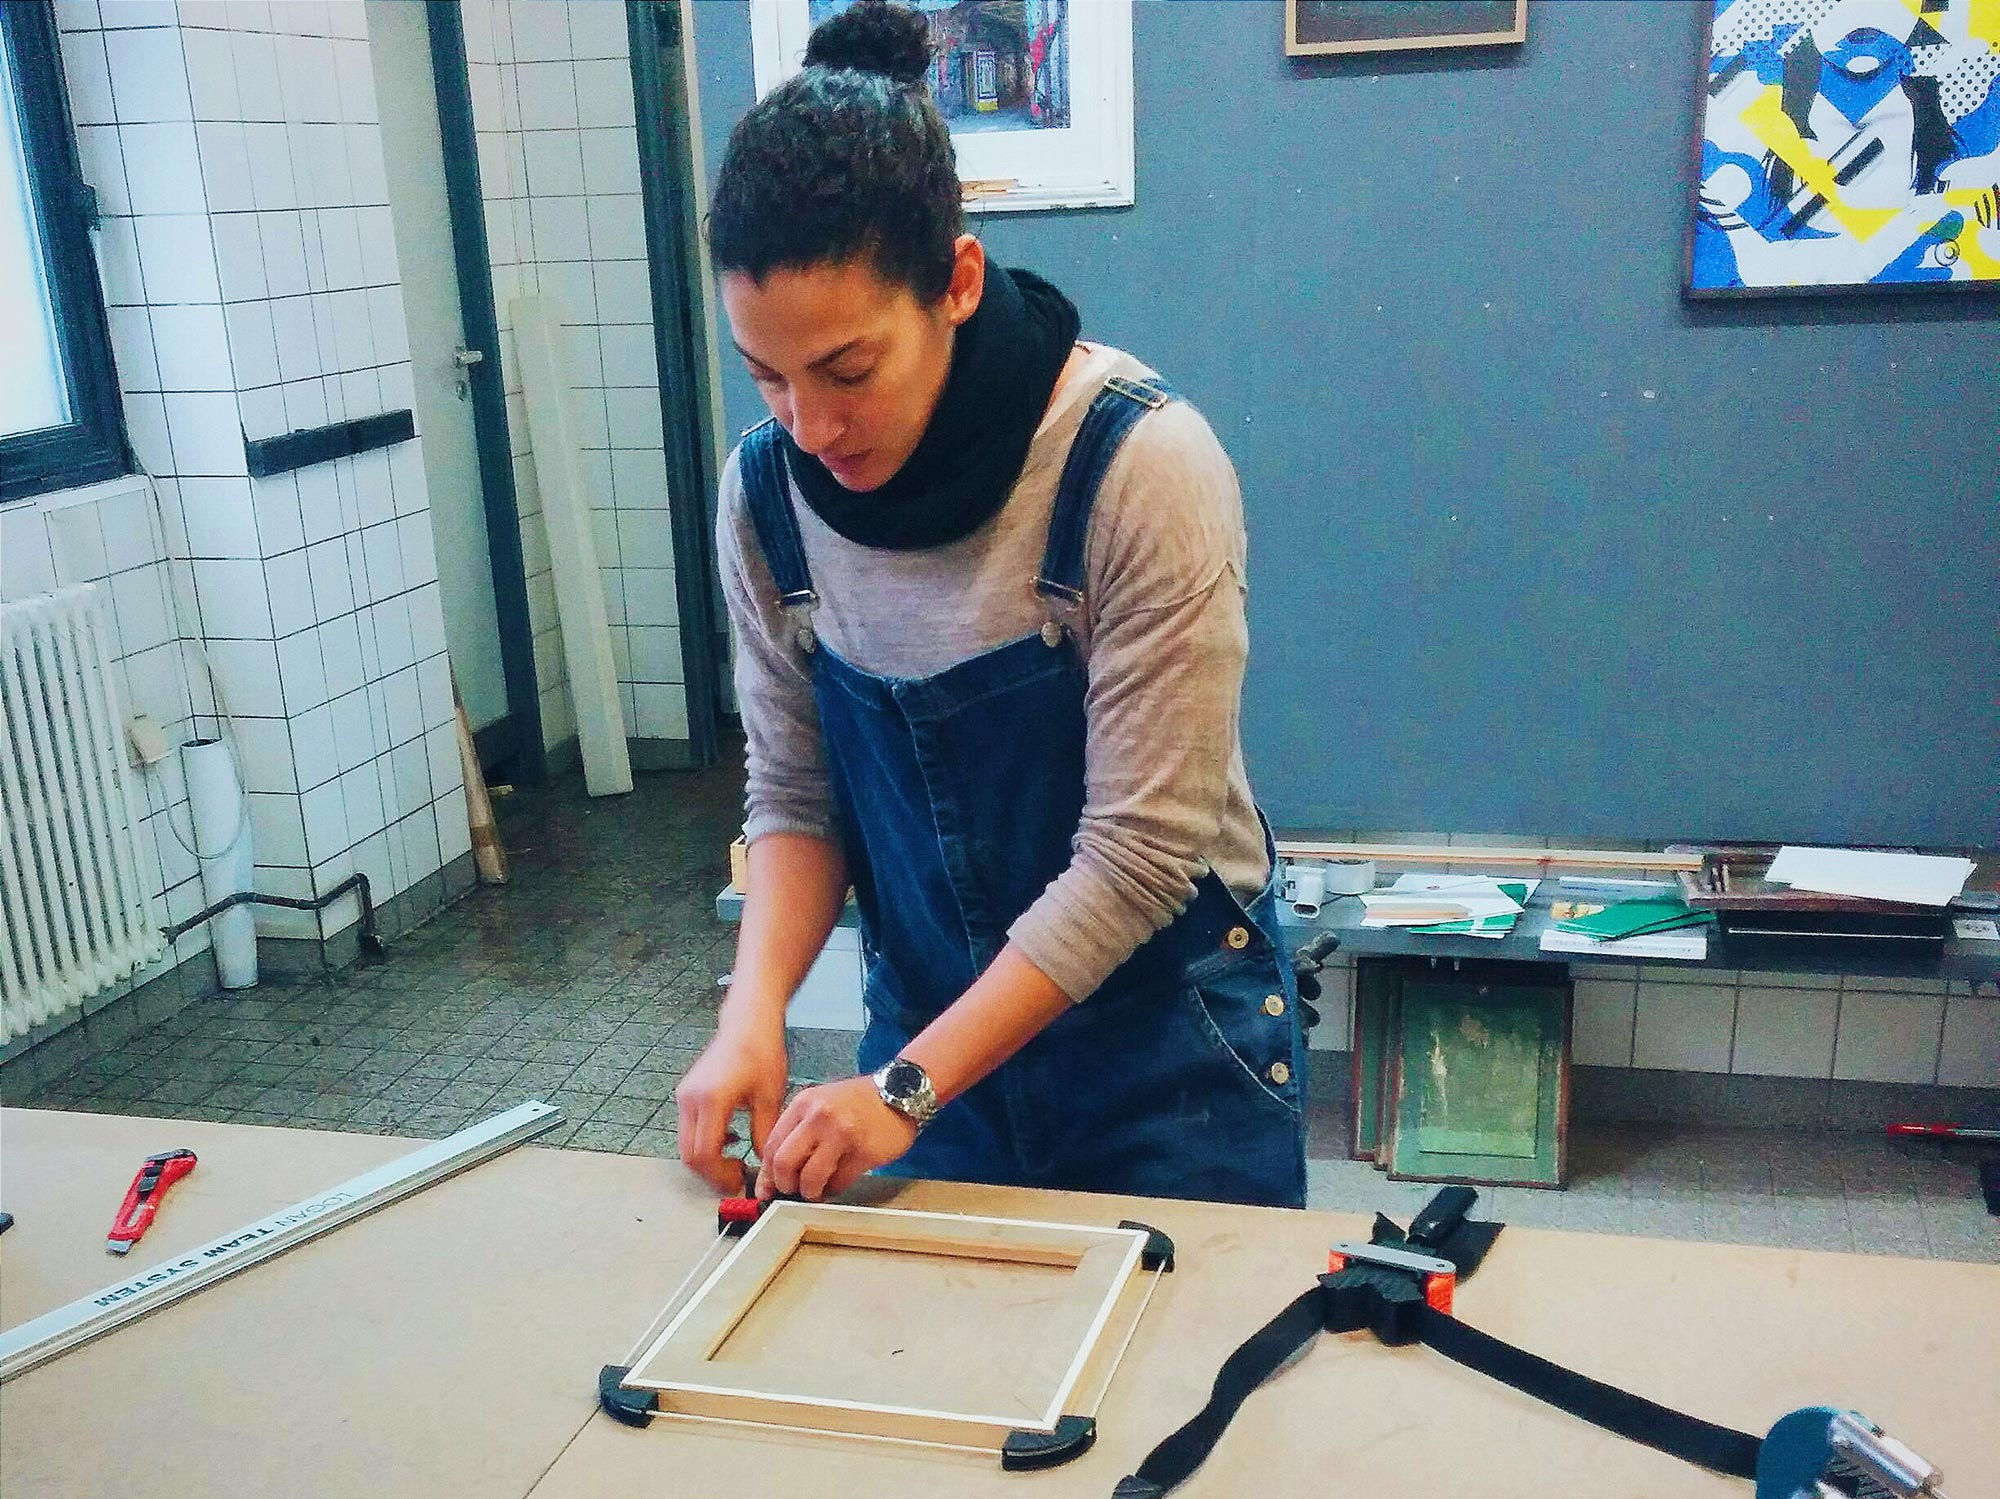 Berlin Wedding Frameworks Claire assembling frame